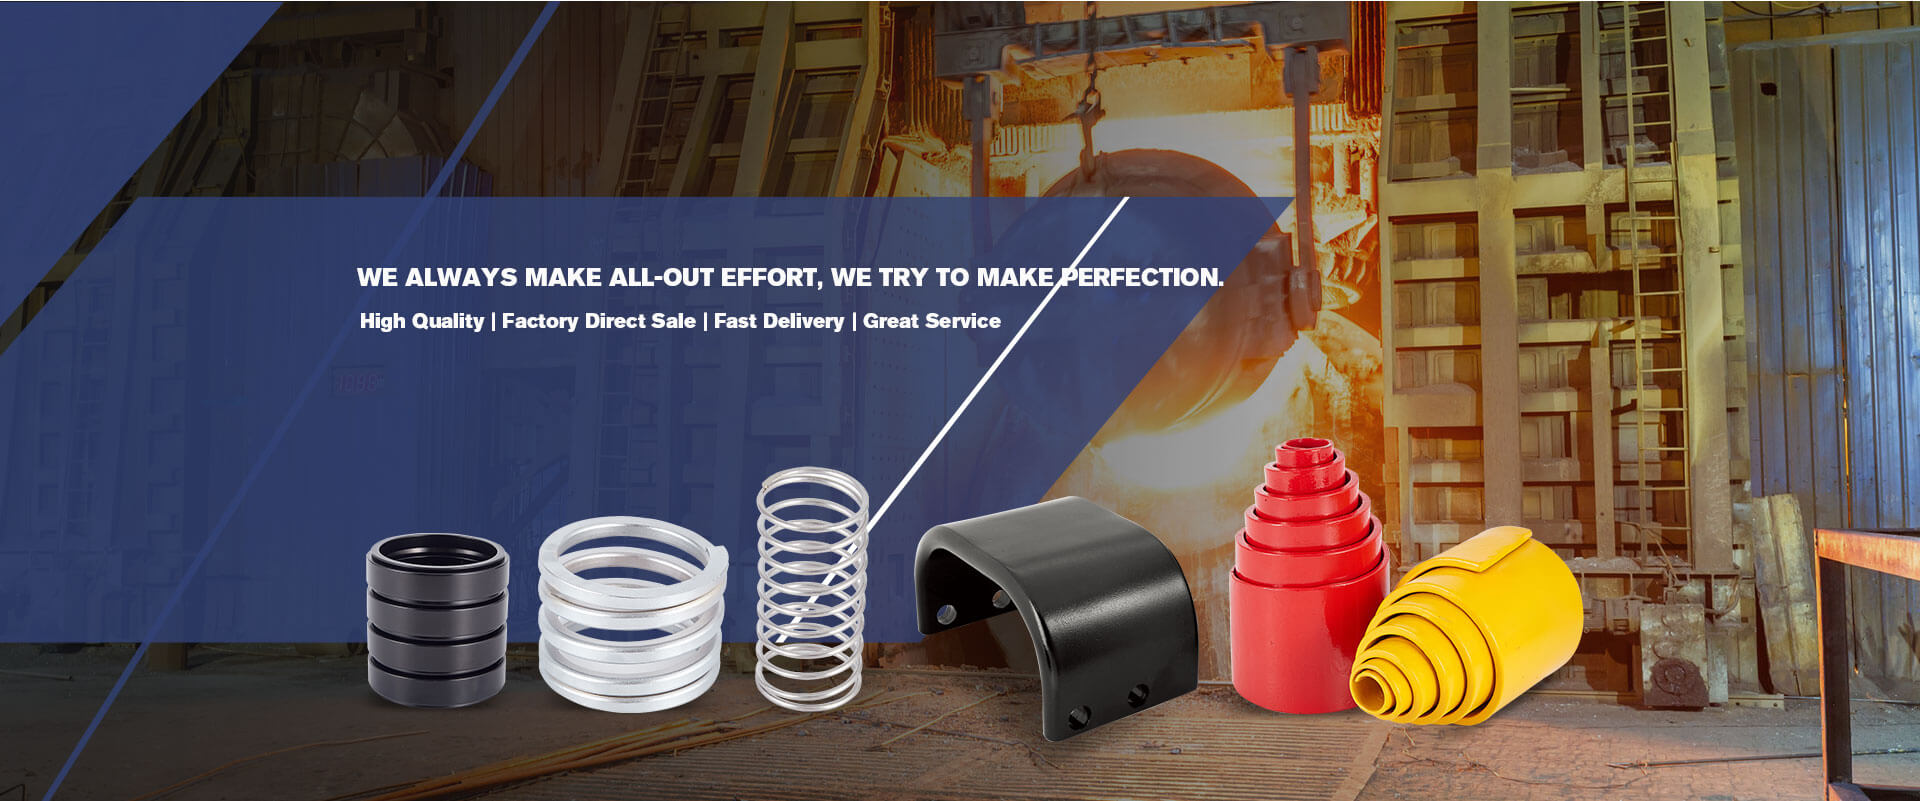 Shanghai Hegong Disc Spring Manufacture Co., Ltd.